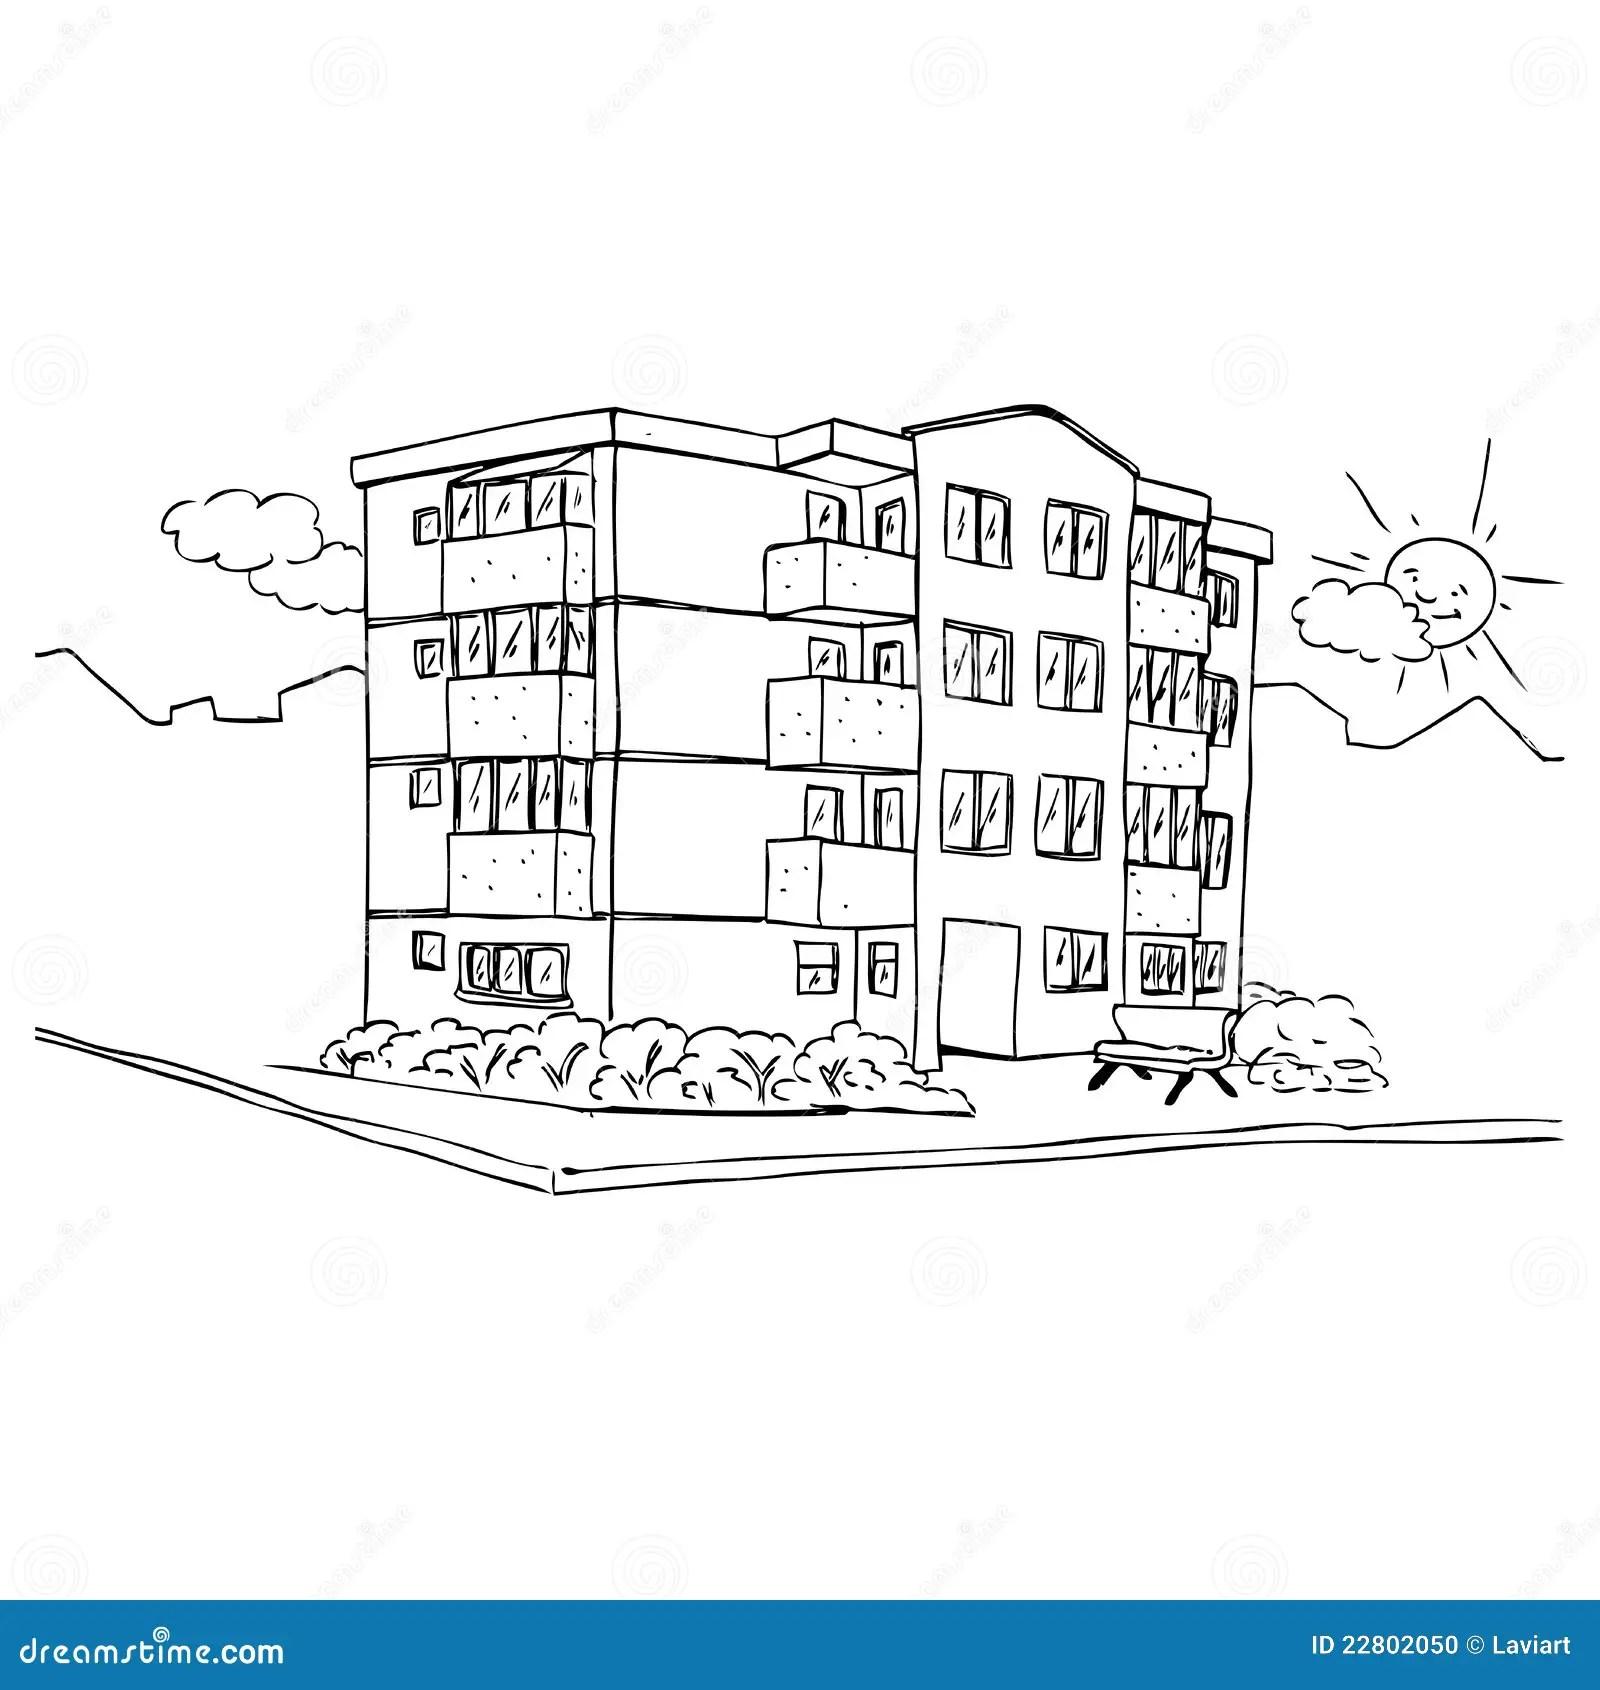 Apartment building stock illustration. Image of street